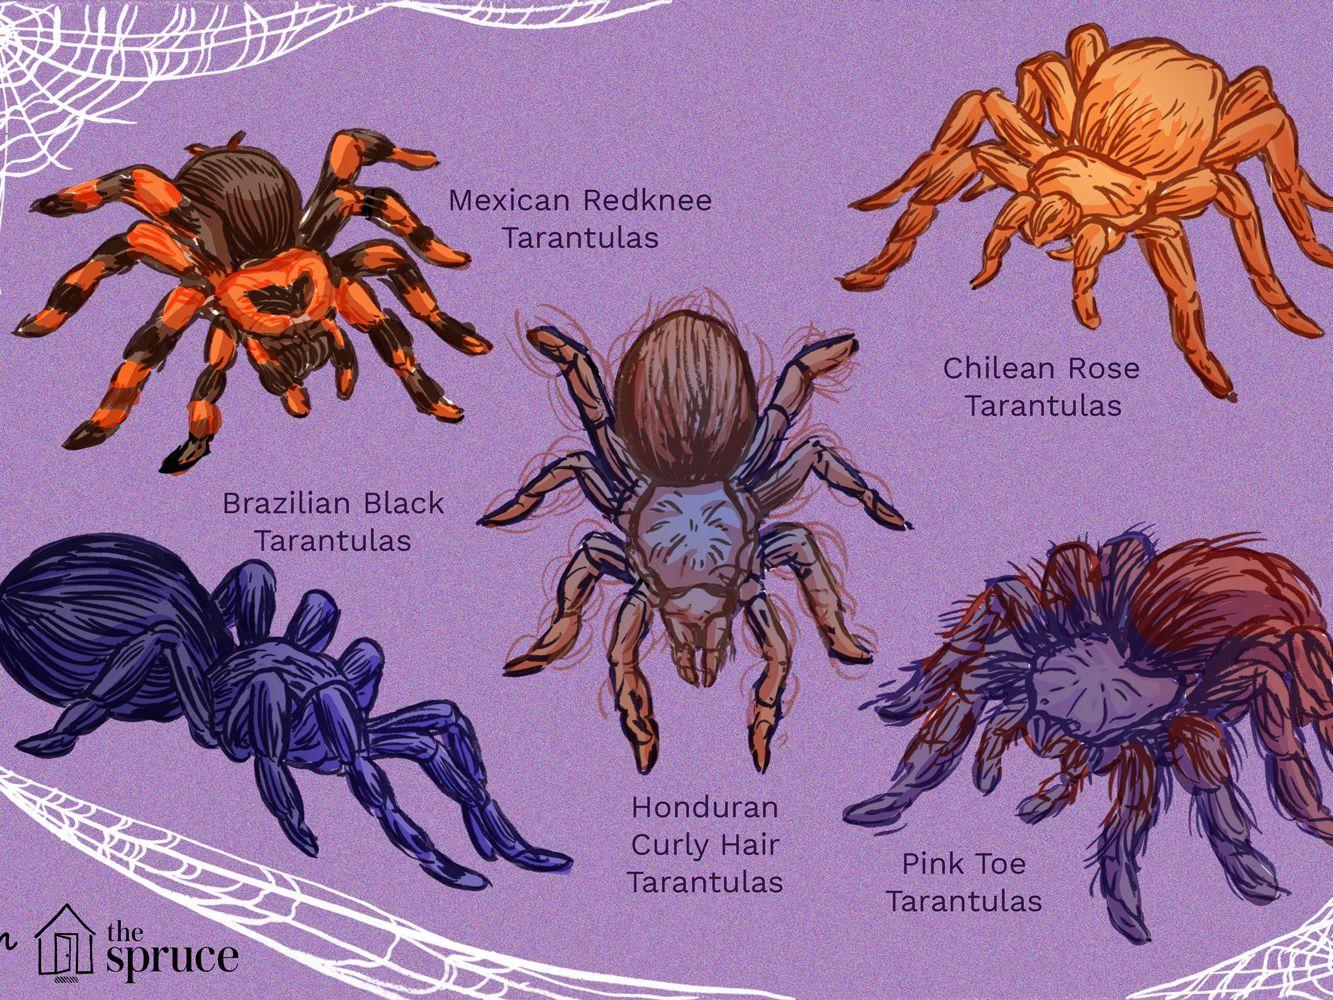 10 Best Tarantula Species To Keep As Pets